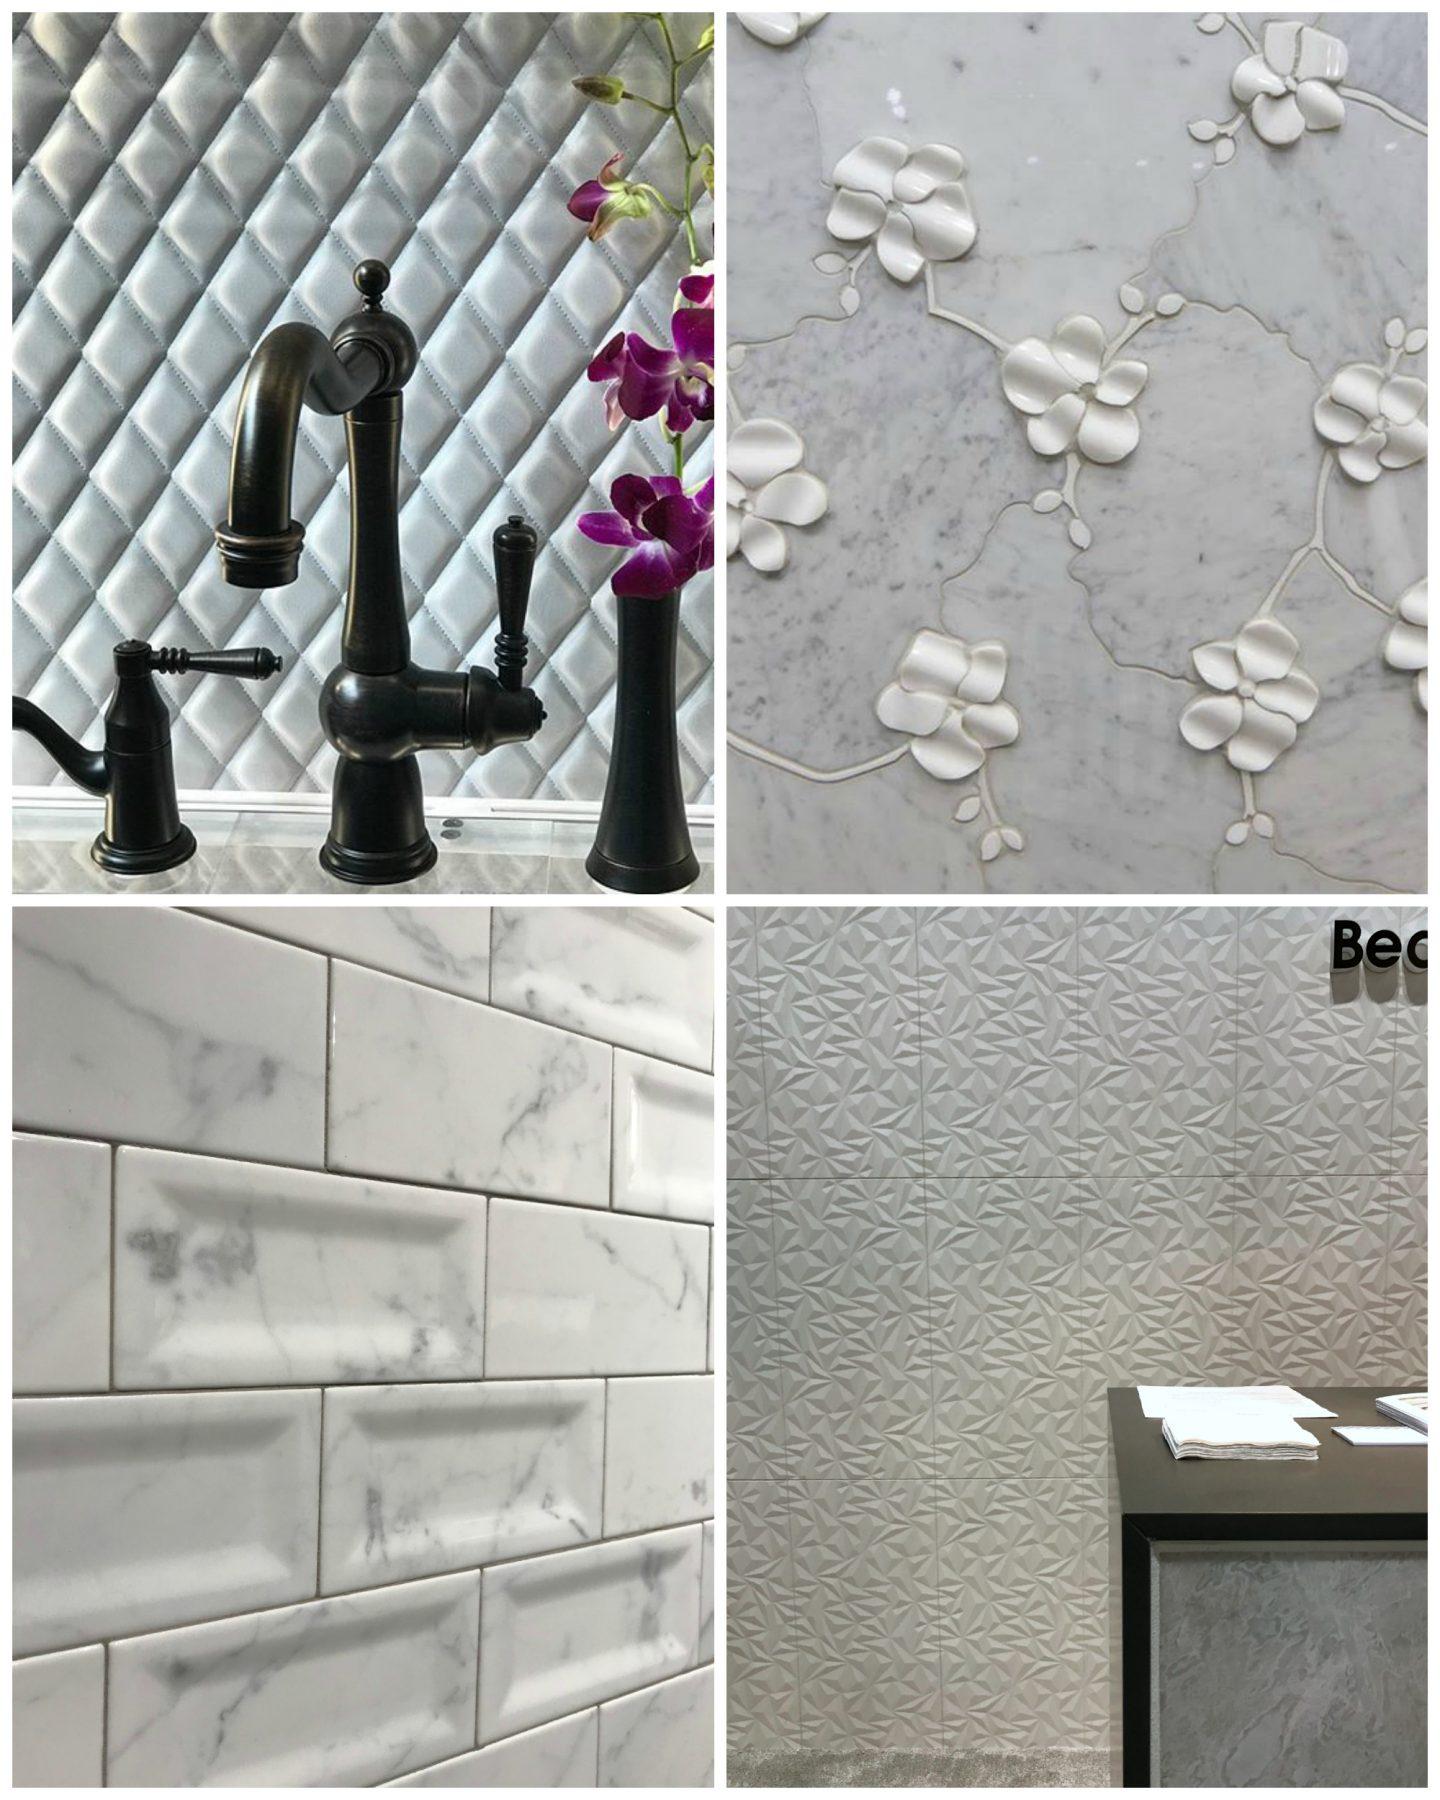 hellopeagreen, KBIS, blogtour KBIS, Kitchen and bathroom design, bathroom trend, luxury bathroom, tiles, 3D tiles